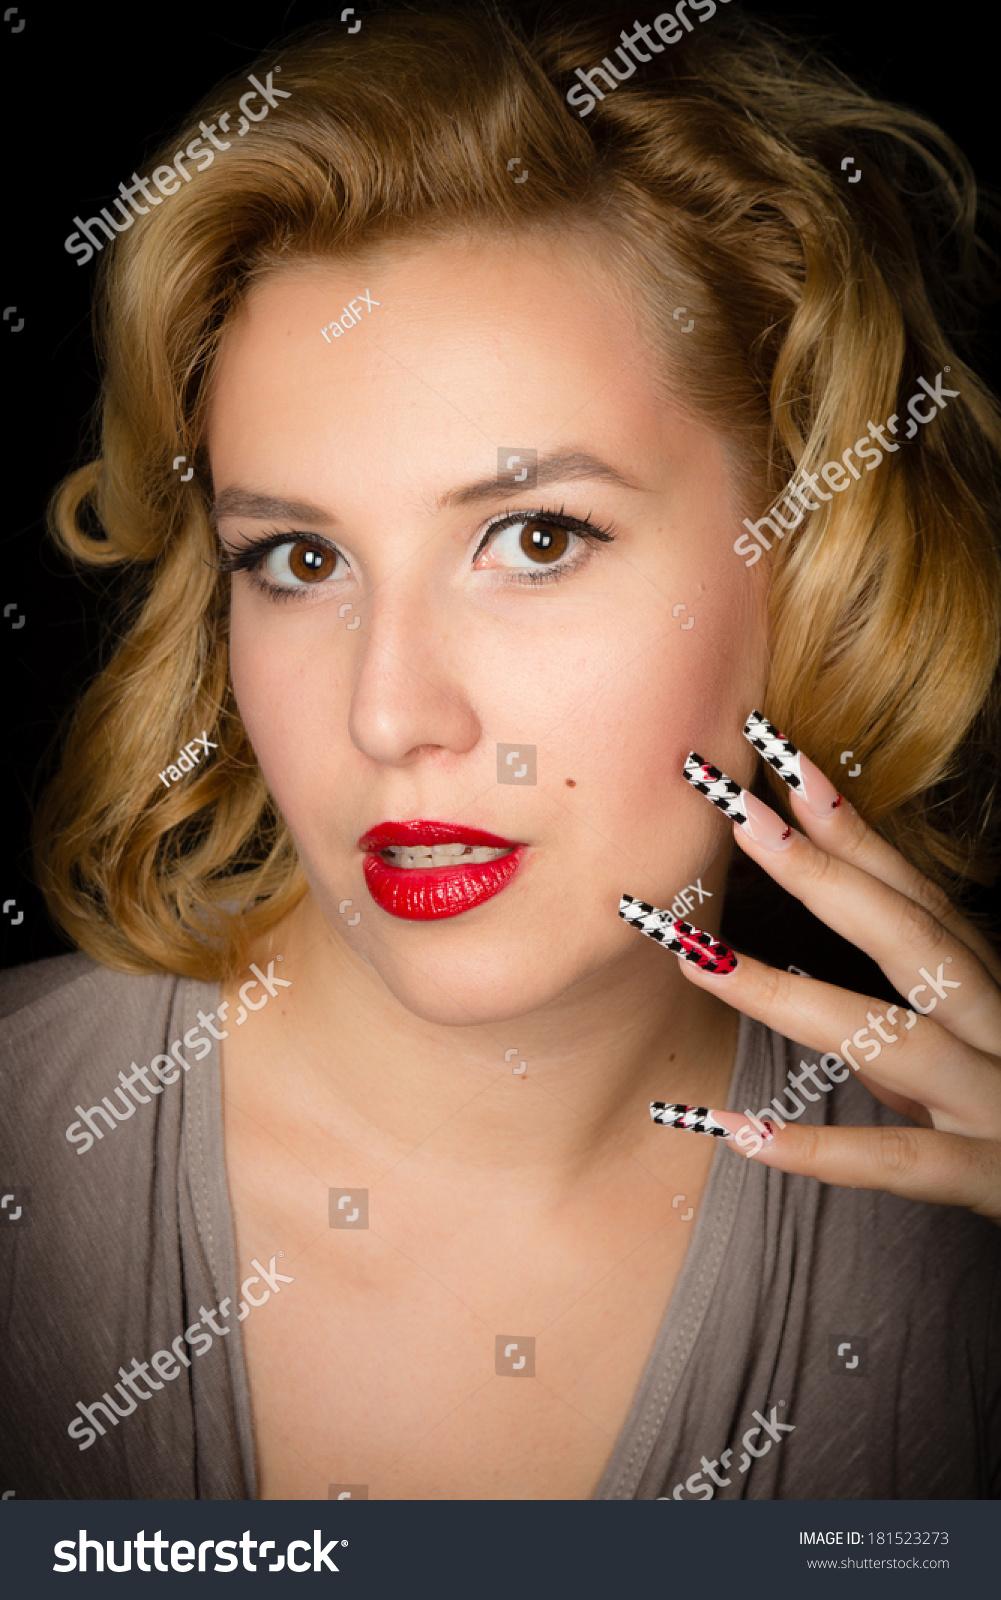 Pretty Blond Girl Model Like Marilyn Stock Photo (Royalty Free ...